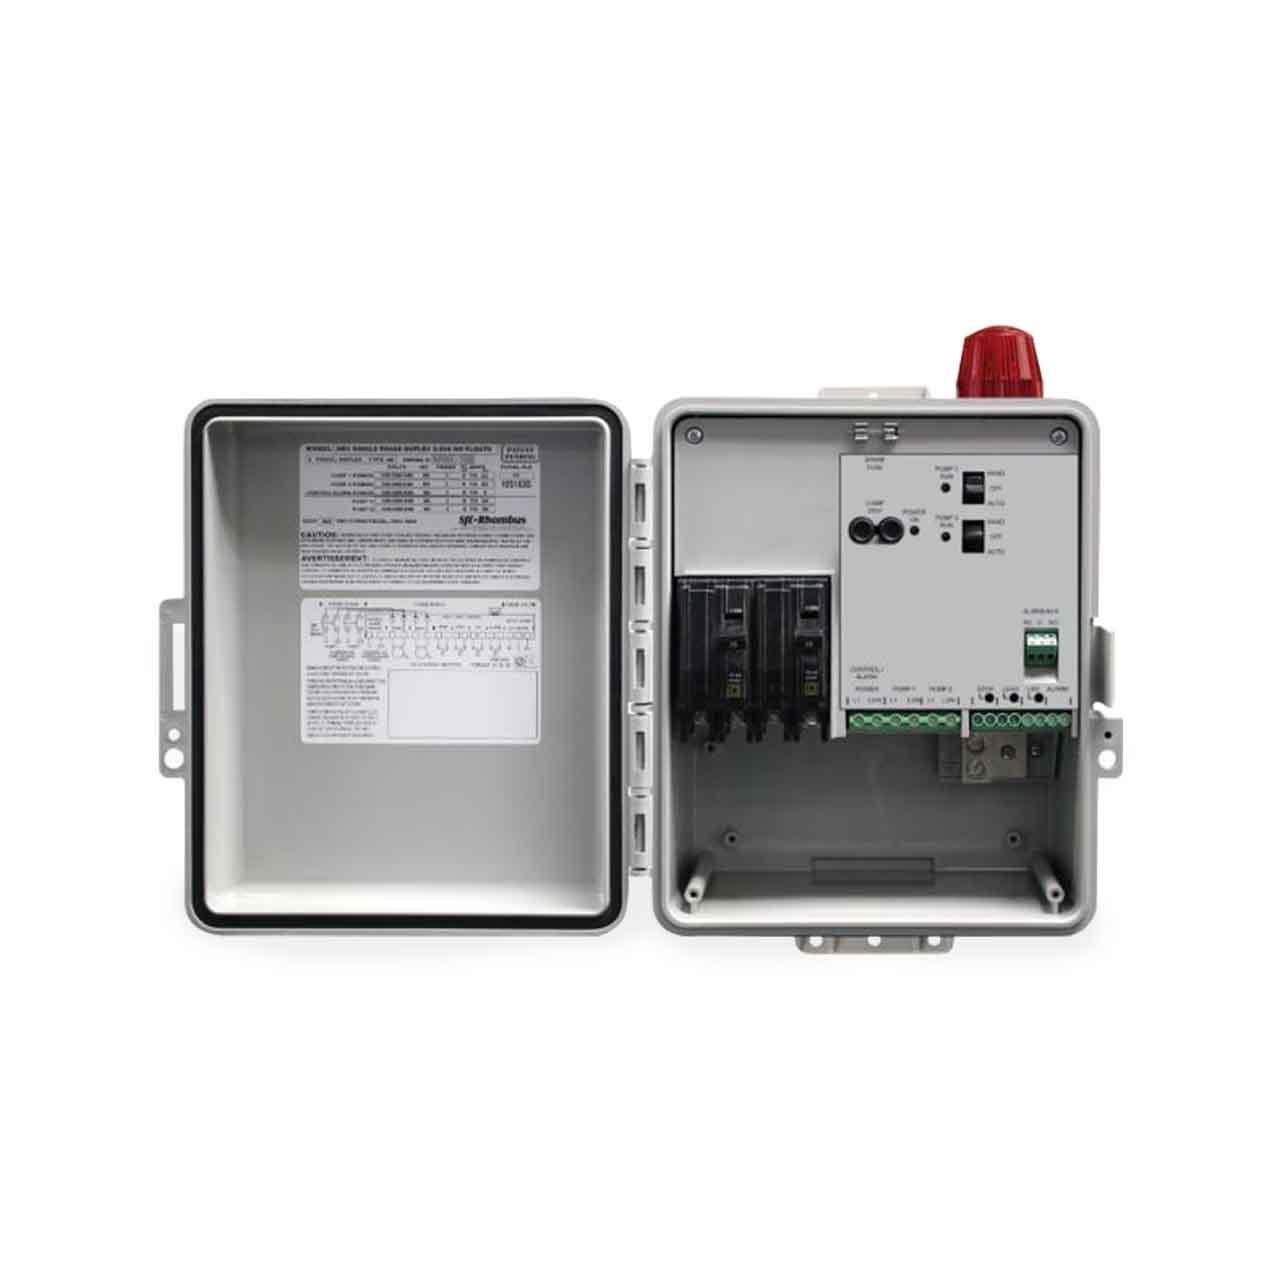 U5b50 U4f9b U5411 U3051 U306c U308a U3048   U305c U3044 U305f U304f120208 Single Phase Transformer